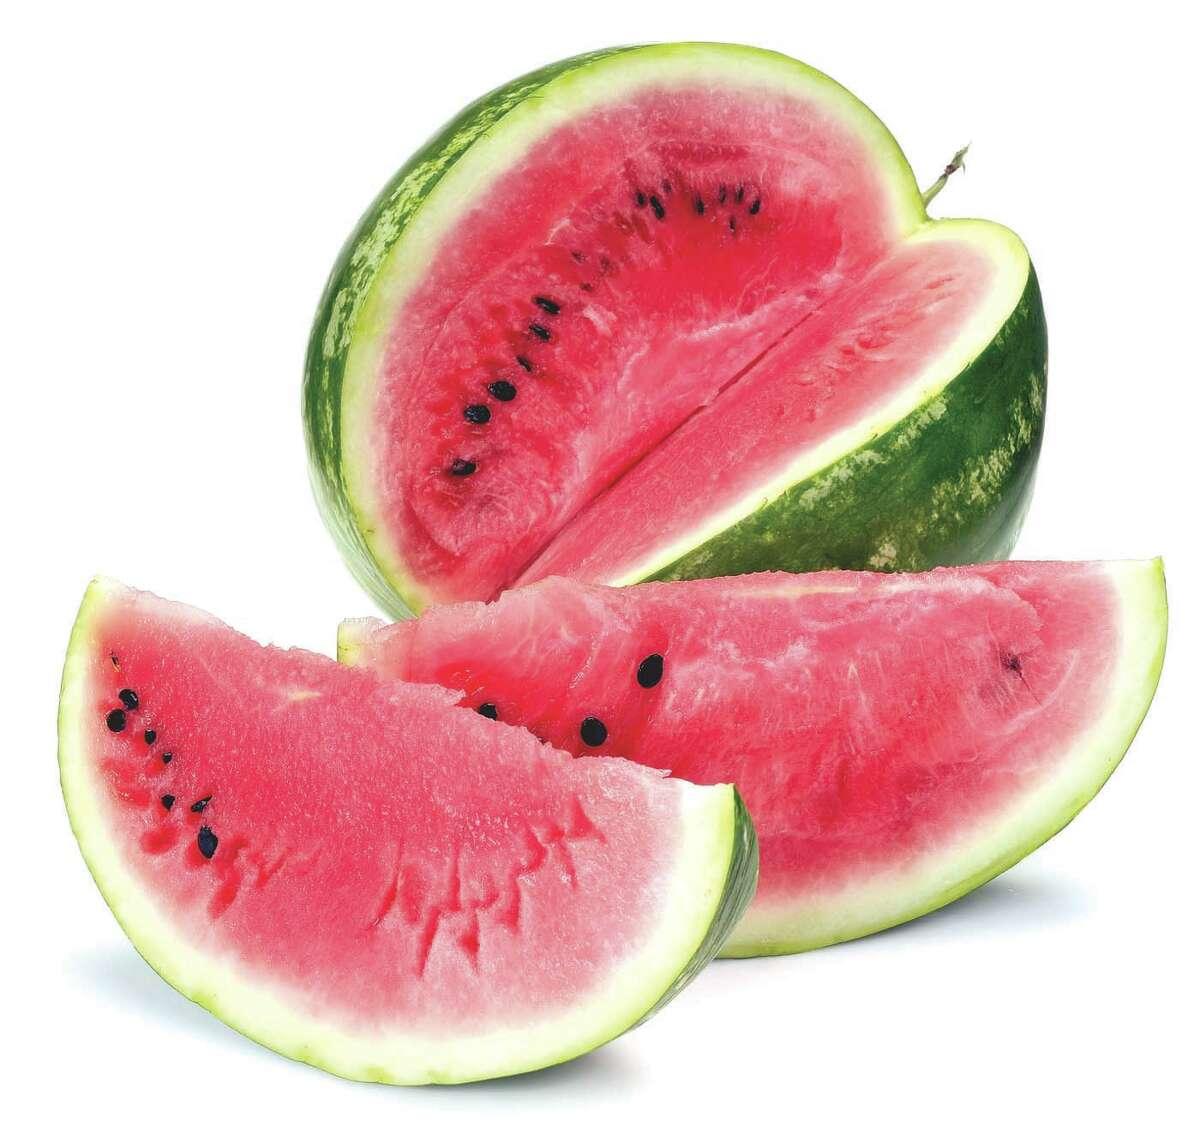 Watermelon, always a summer treat.